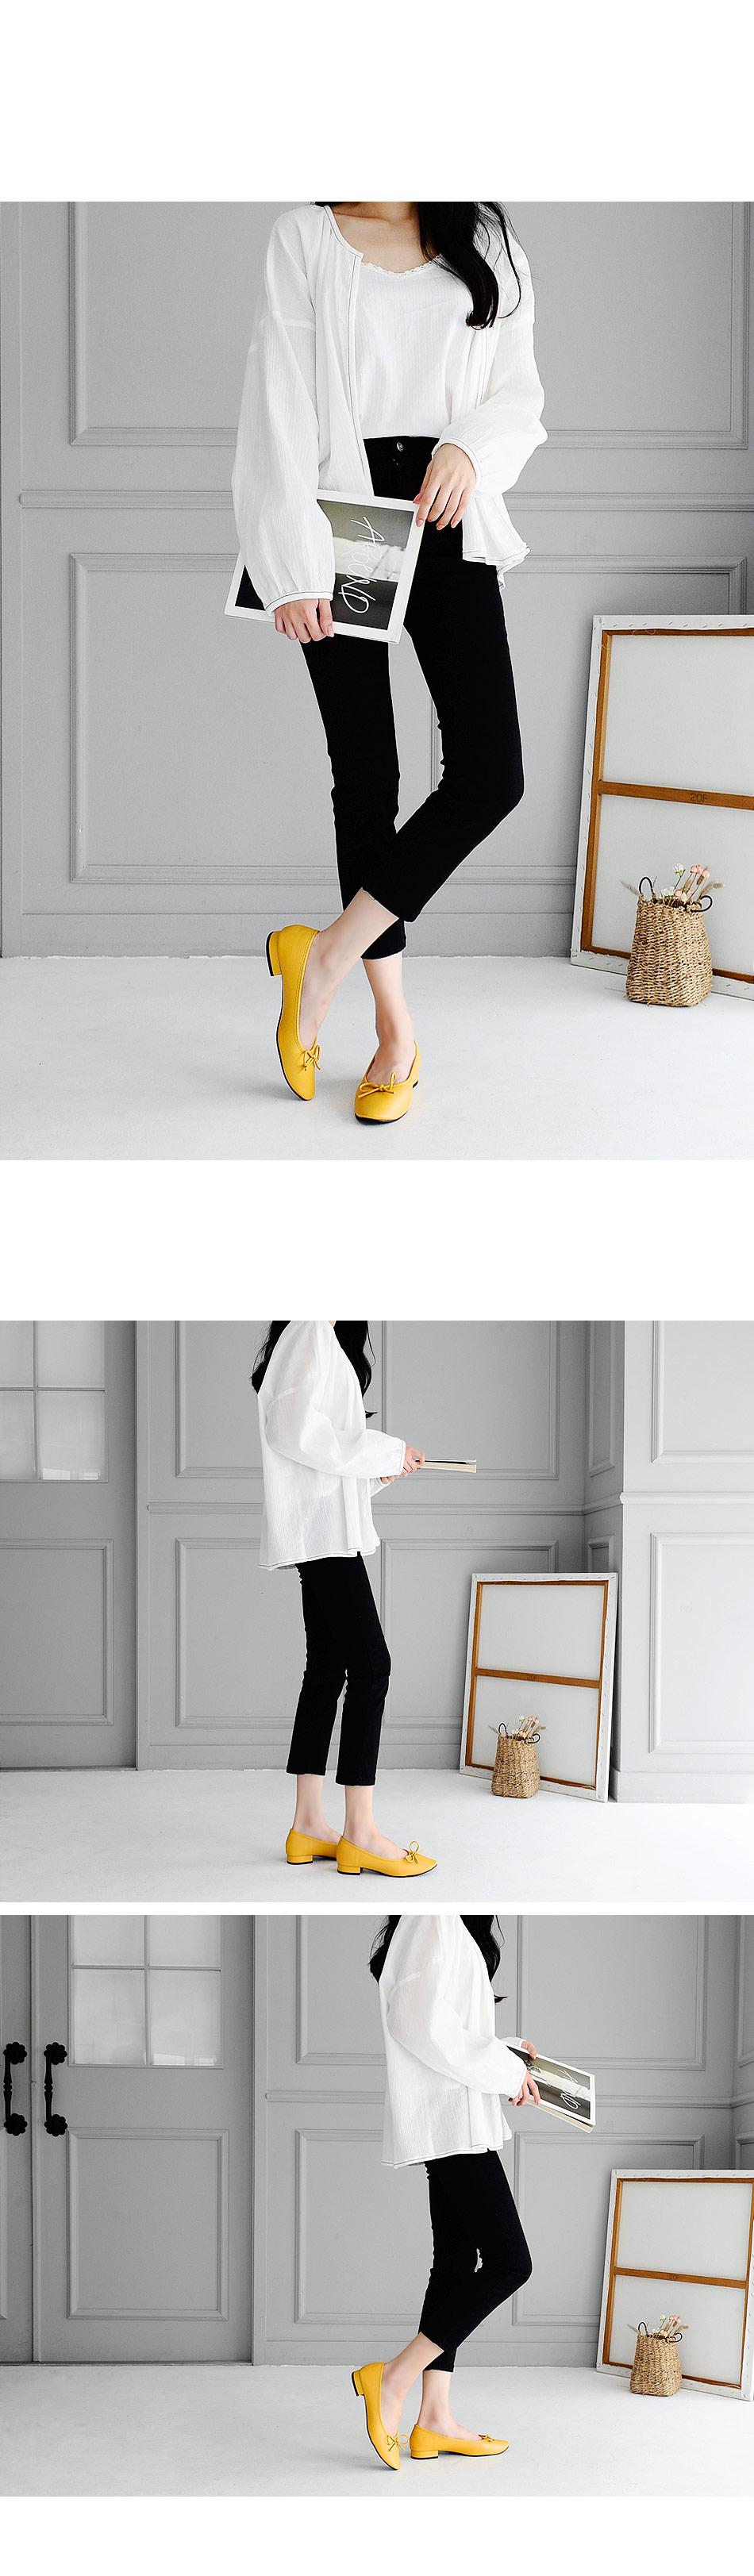 Tolan flat shoes 2cm